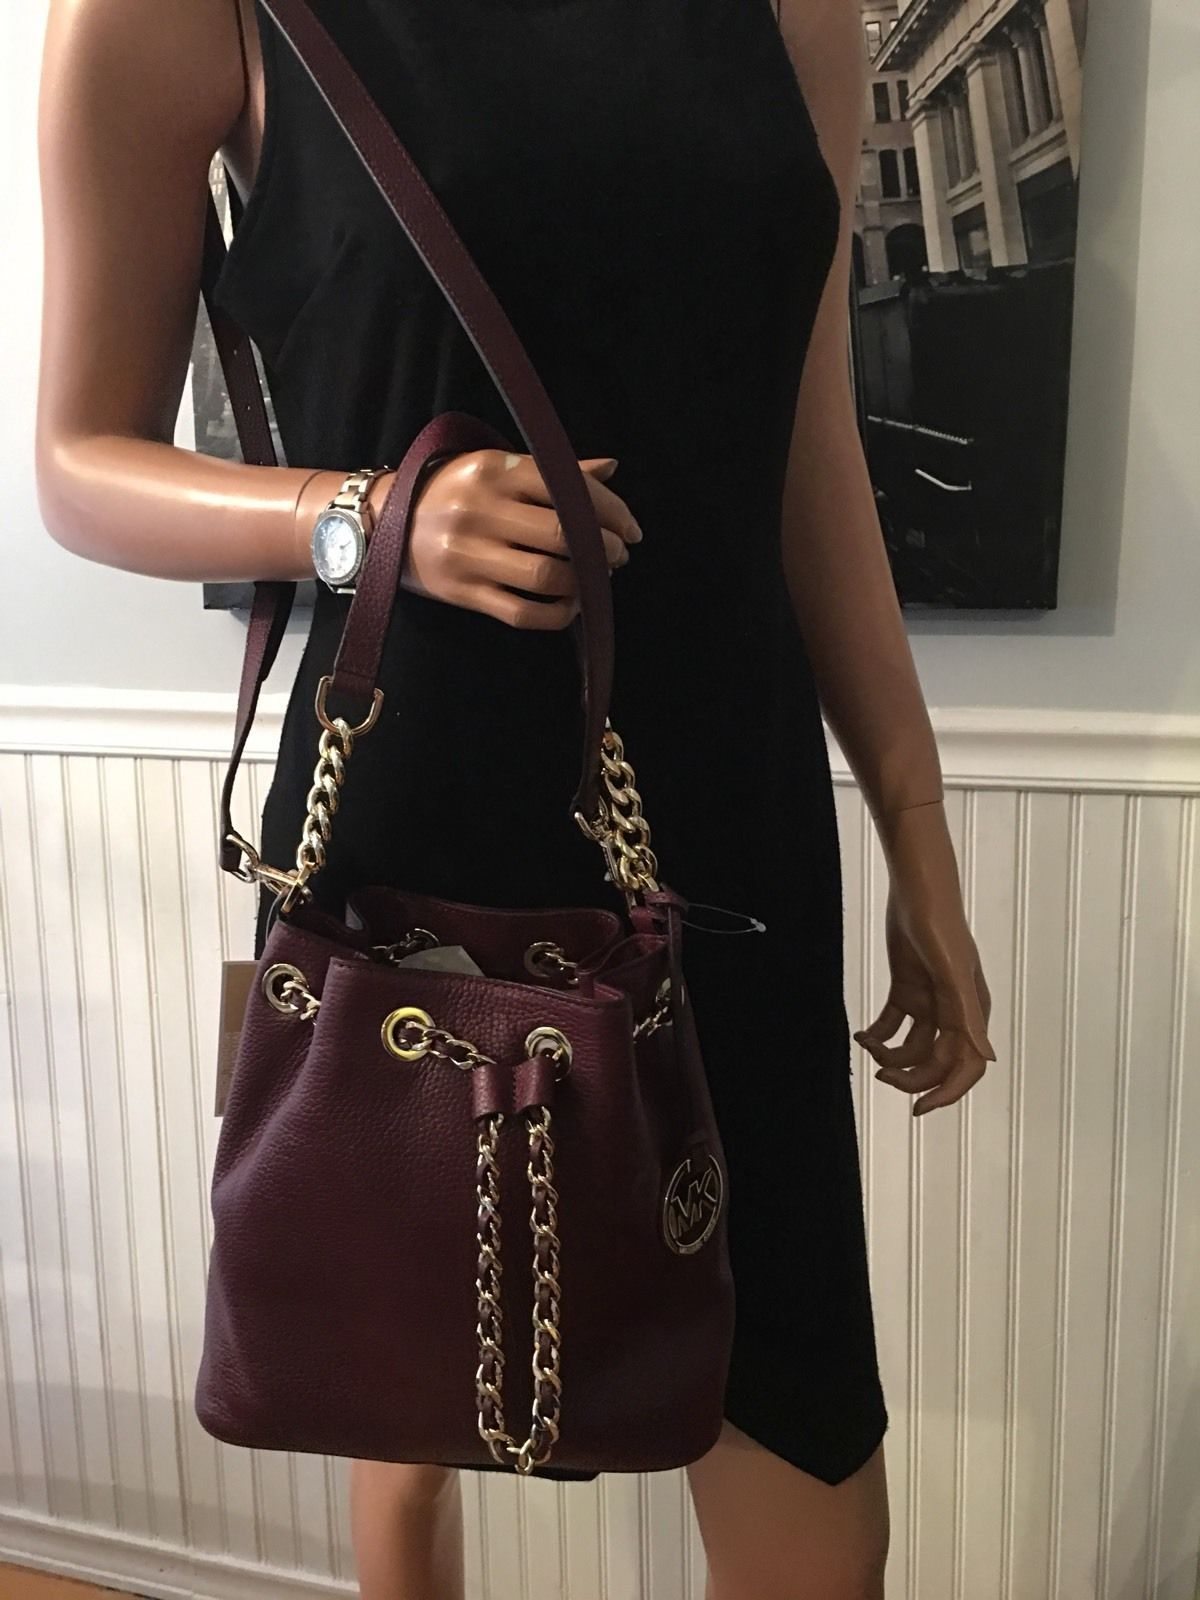 4cca3e48edc276 ... NWT Michael Kors Frankie Medium Drawstring Messenger Merlot Leather Bag  298 164.95 ...